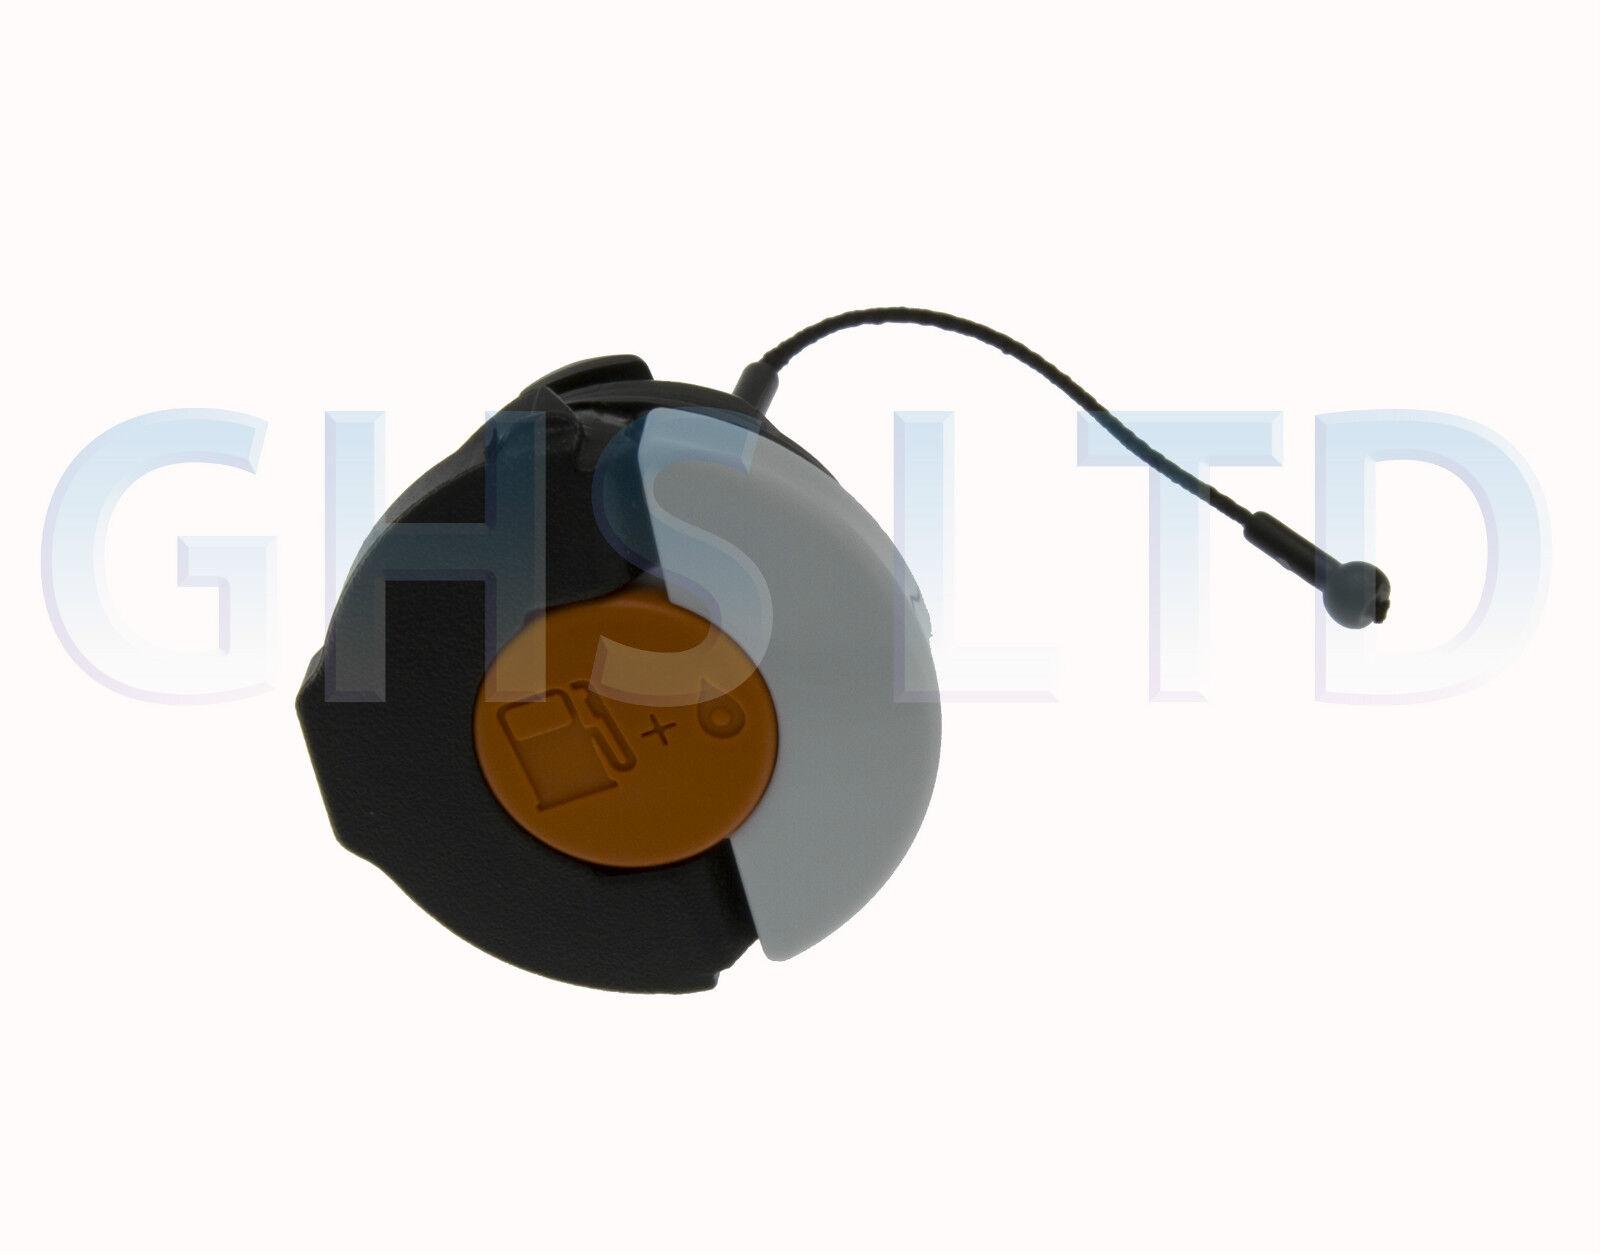 stihl fs 56 parts diagram ecu wiring toyota corolla km 90 r bg 85 elsavadorla